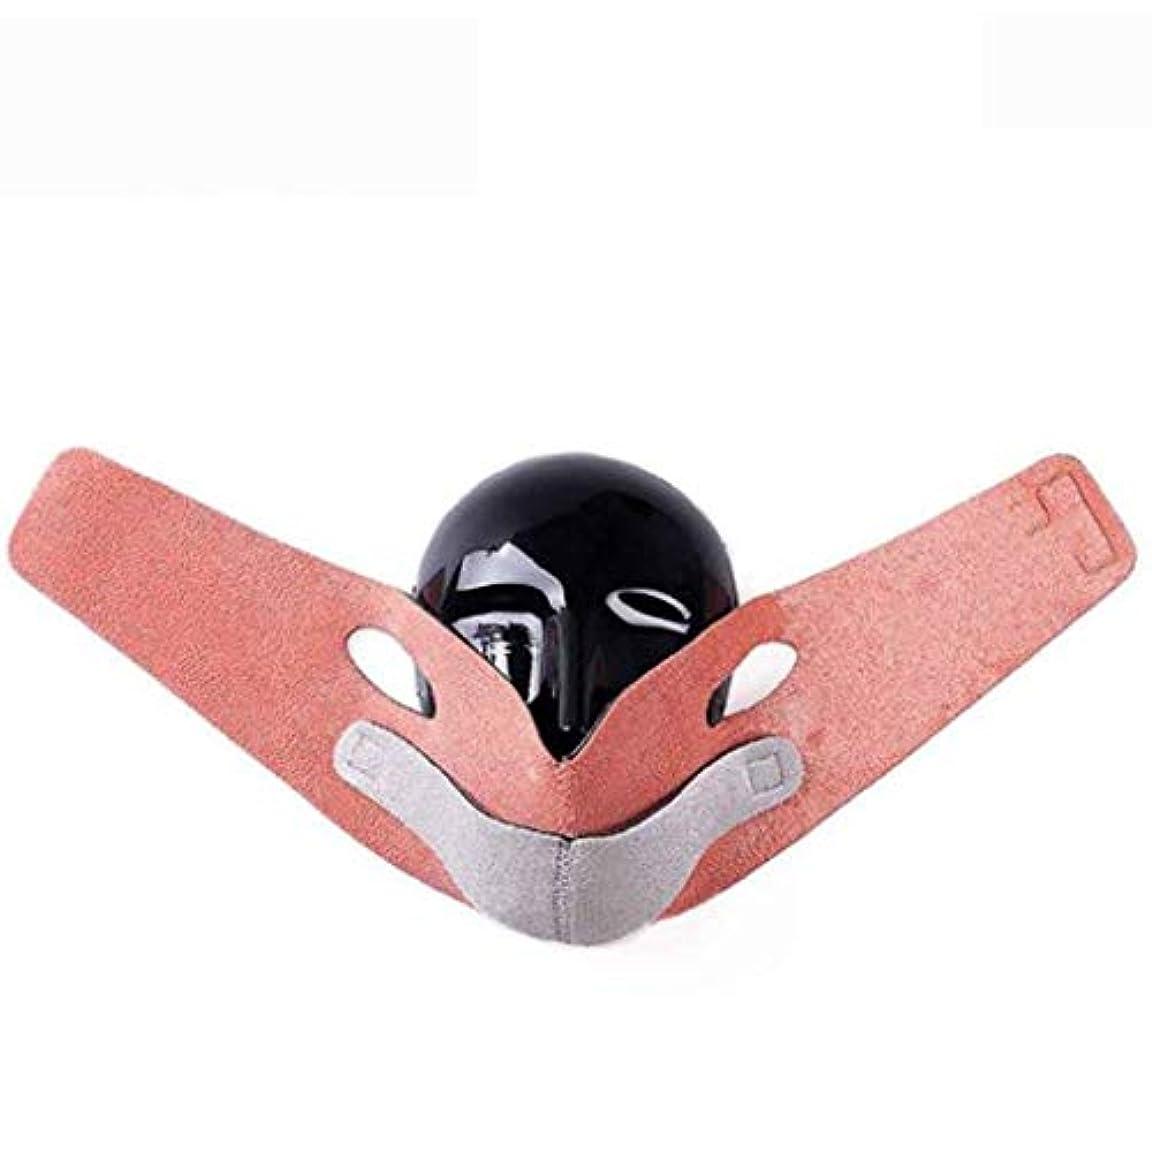 Vフェイスマスク - リフティングフェイスロスダブルチン - スモールフェイス包帯矯正フェイスタイプ